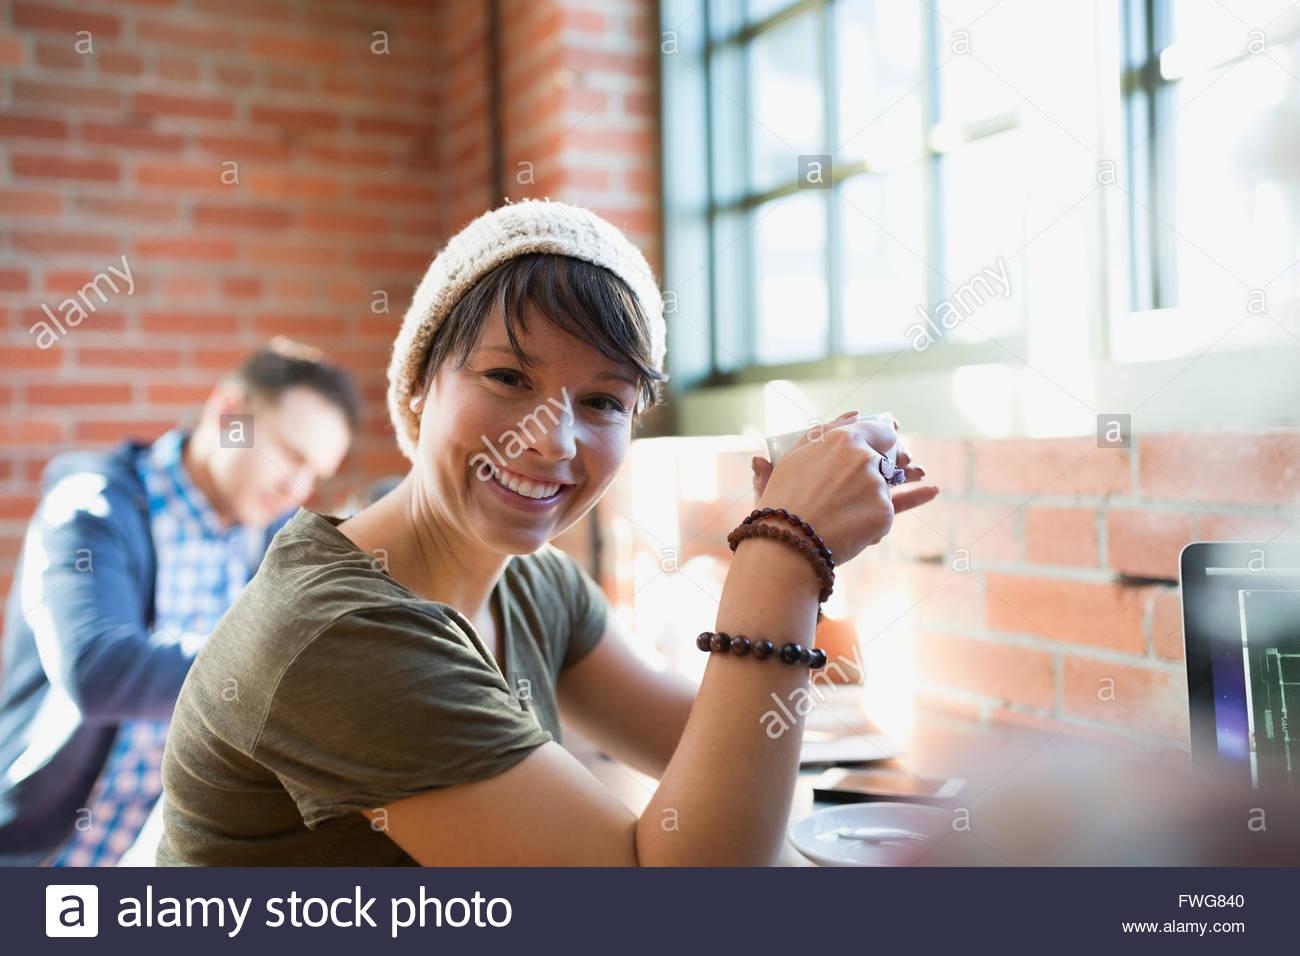 Lächelnde Frau Porträt Kaffeetrinken in Coffee-shop Stockbild